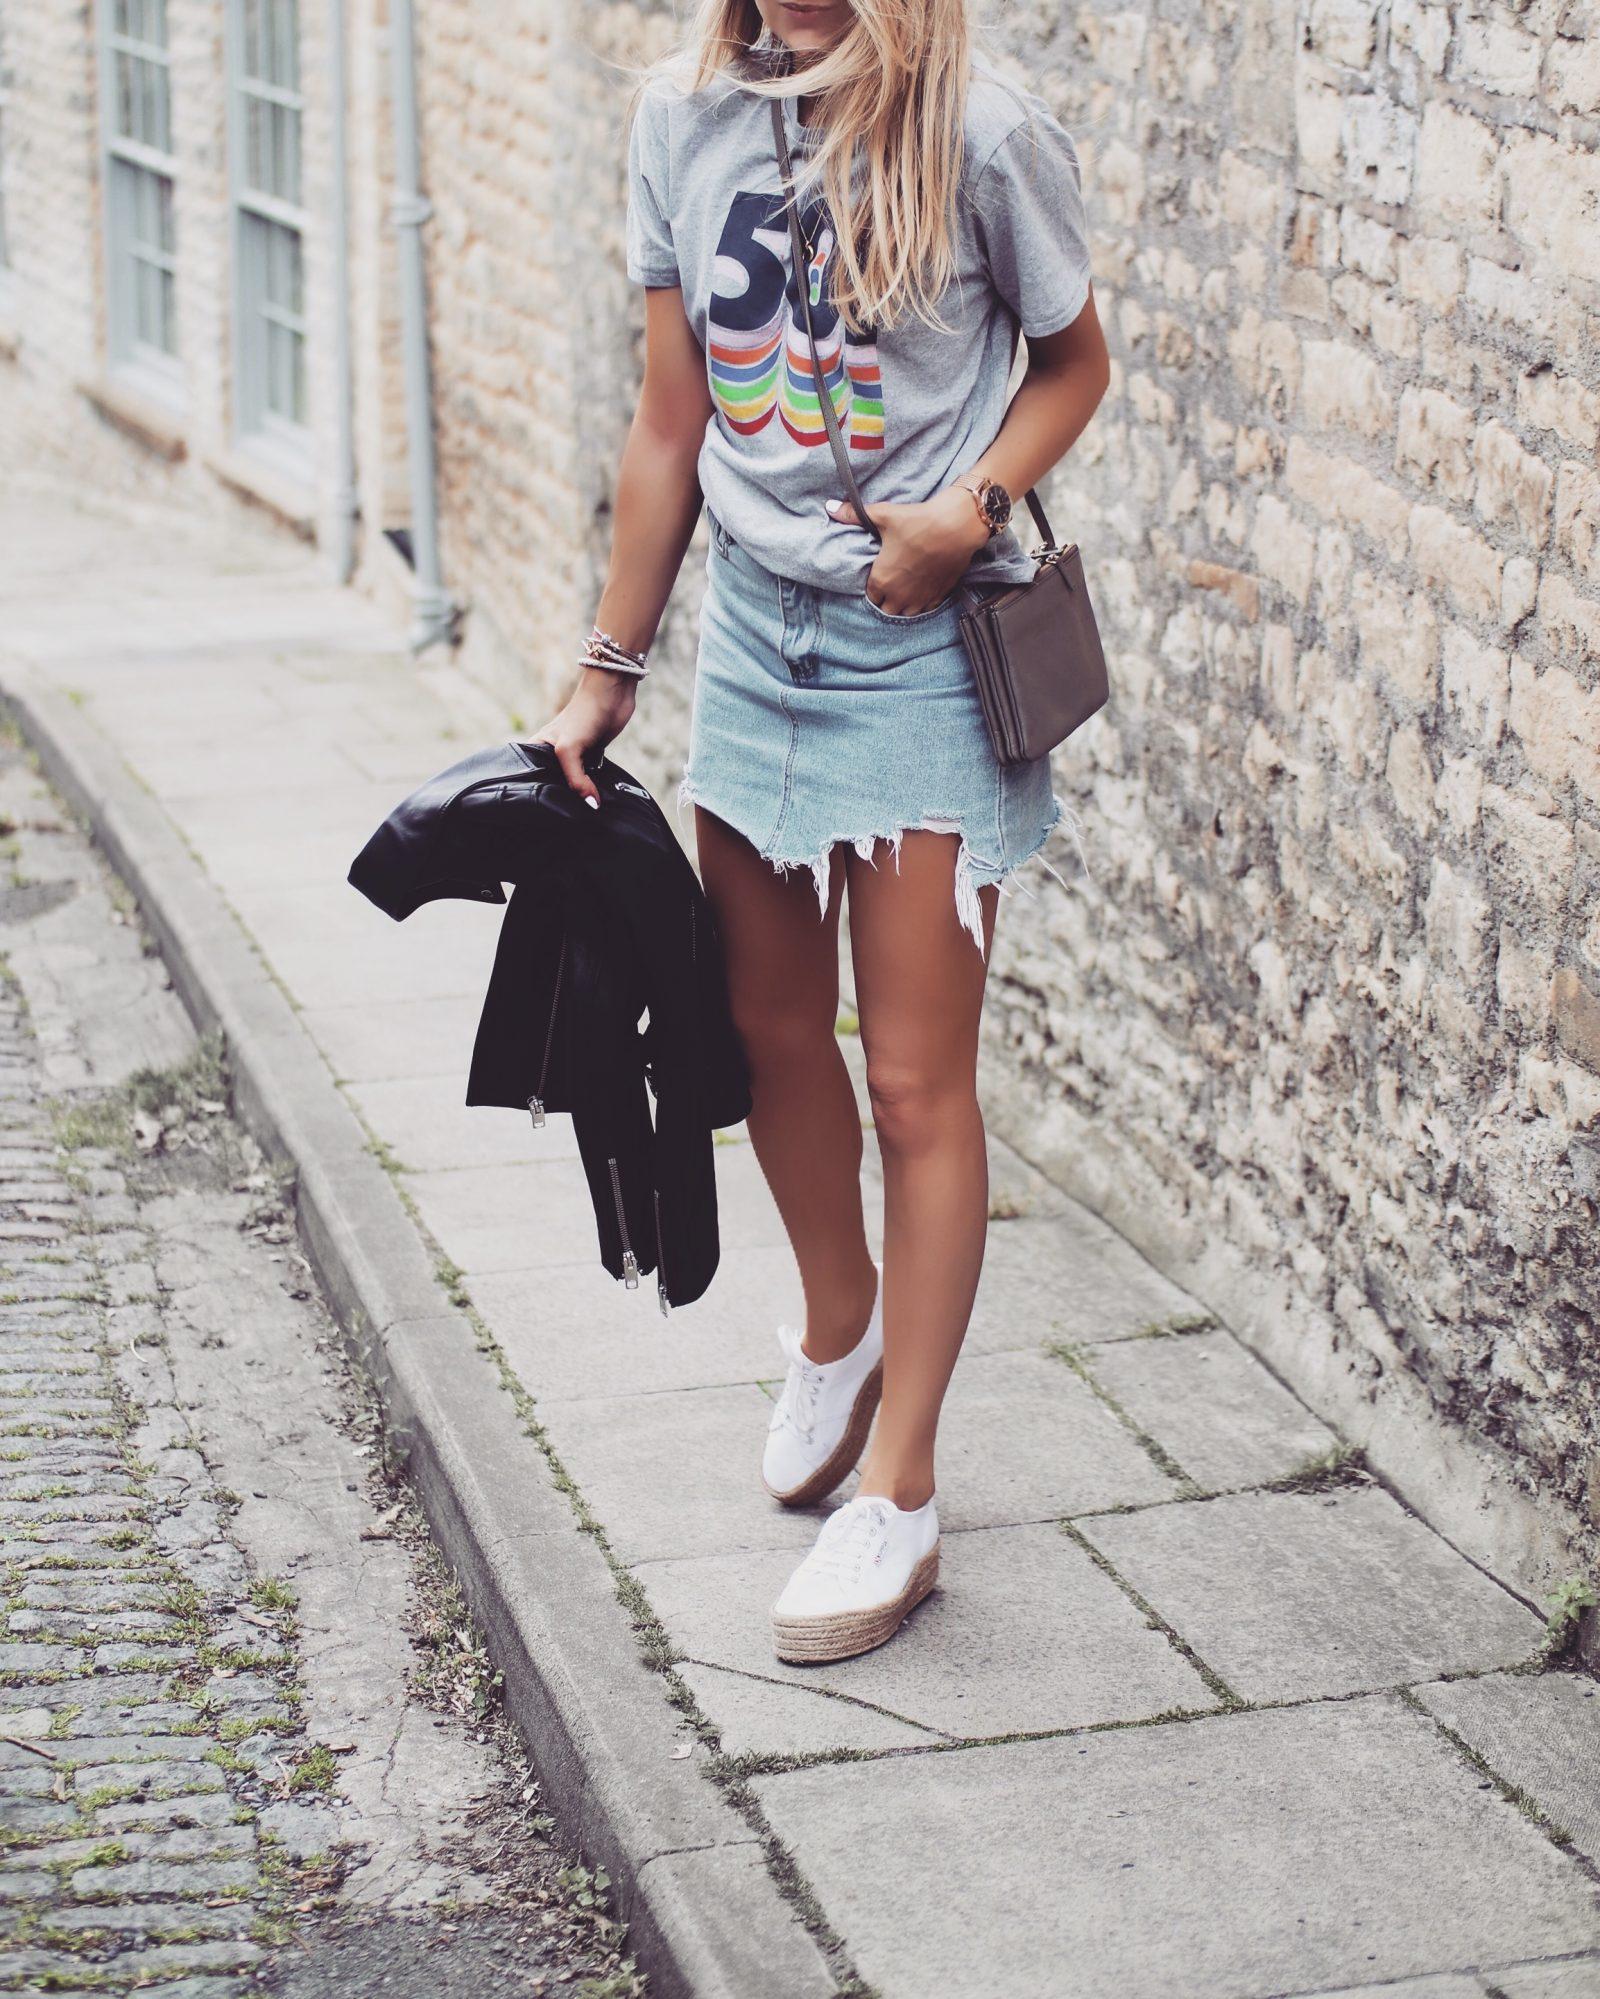 Leather Jacket - Summer Street Style